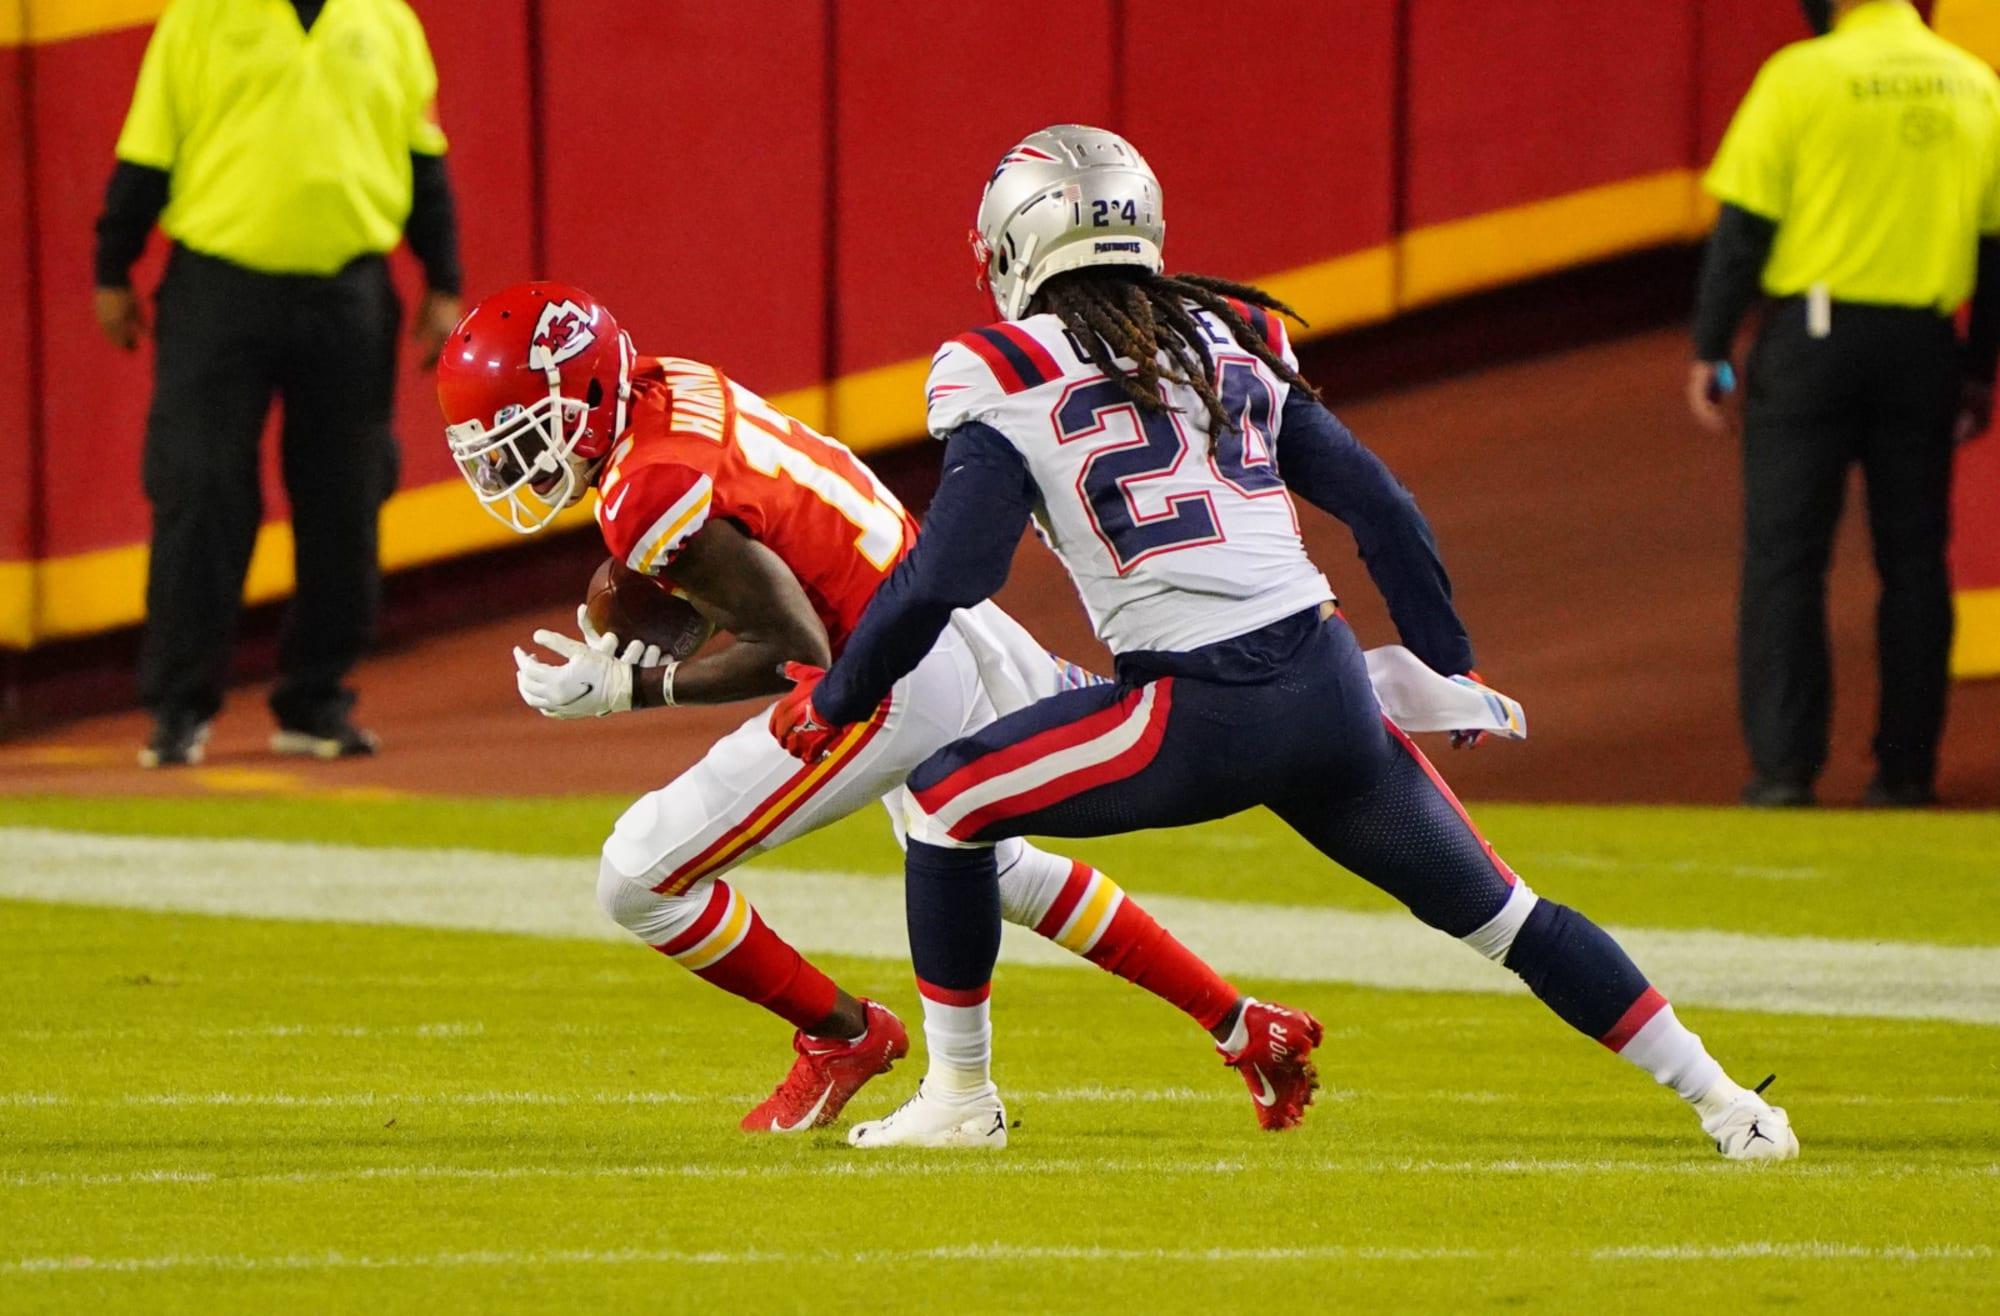 South Carolina football: Stephon Gilmore and Rashad Fenton battle ...